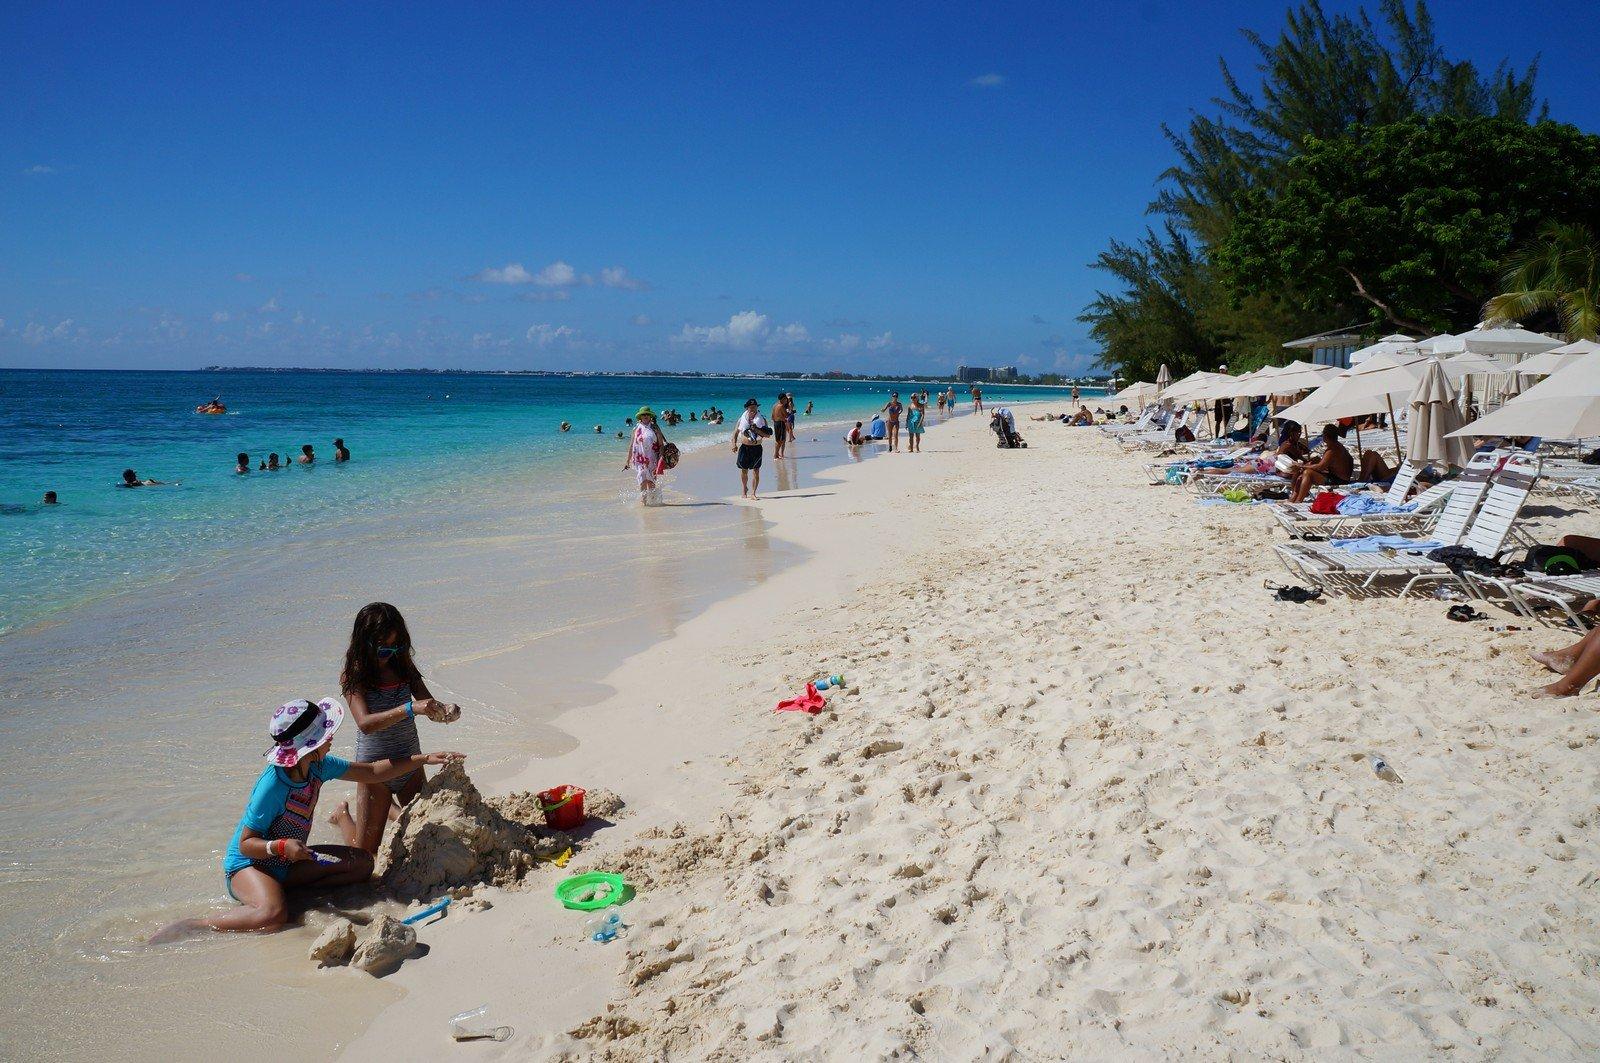 Excursion Focus Royal Palms Beach Club In Grand Cayman